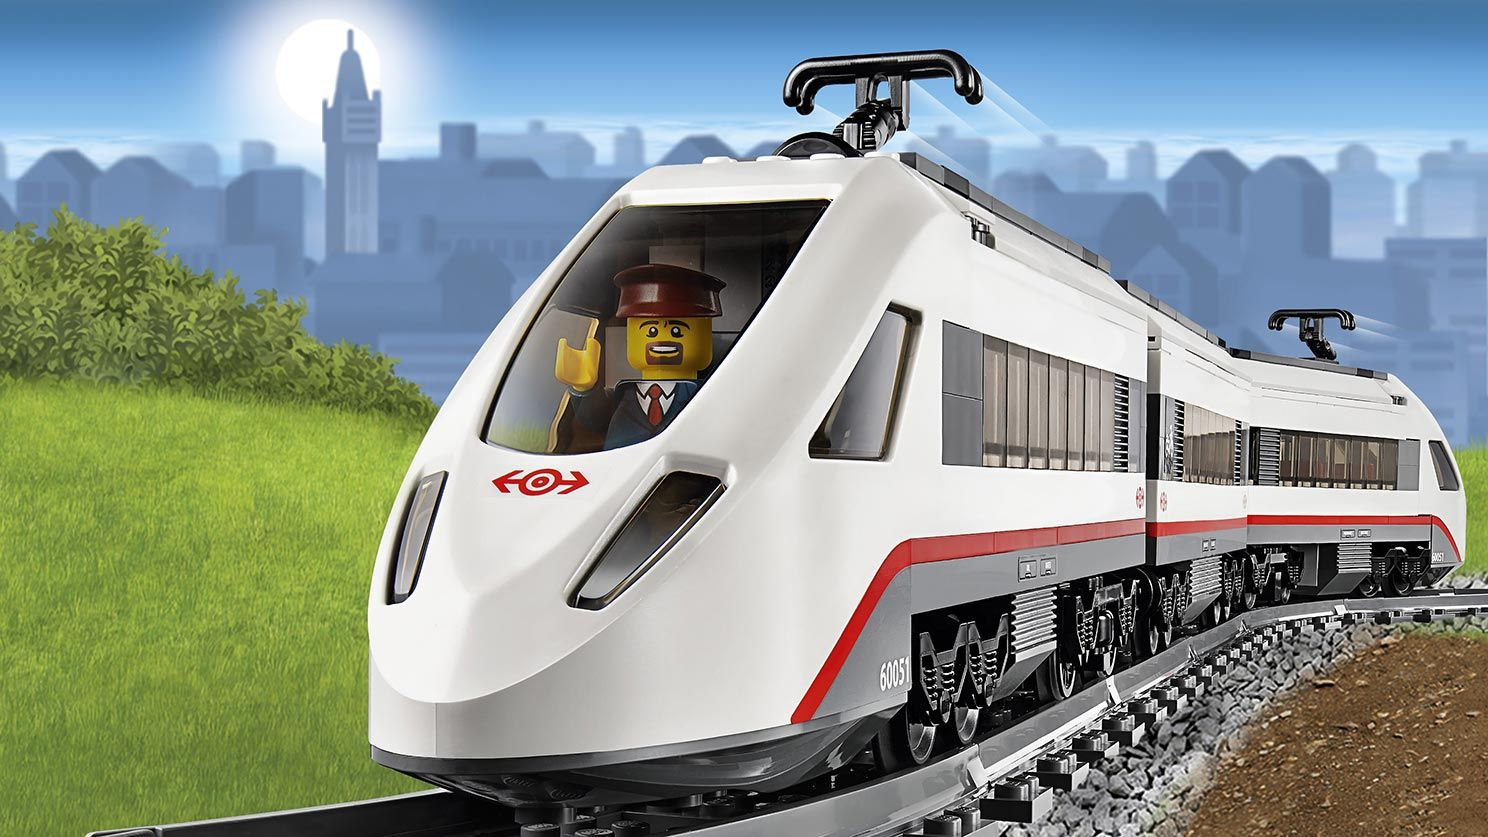 Lego City Train On Tracks High Speed Passenger Train 60051 Lego City Train Lego City Lego City Sets